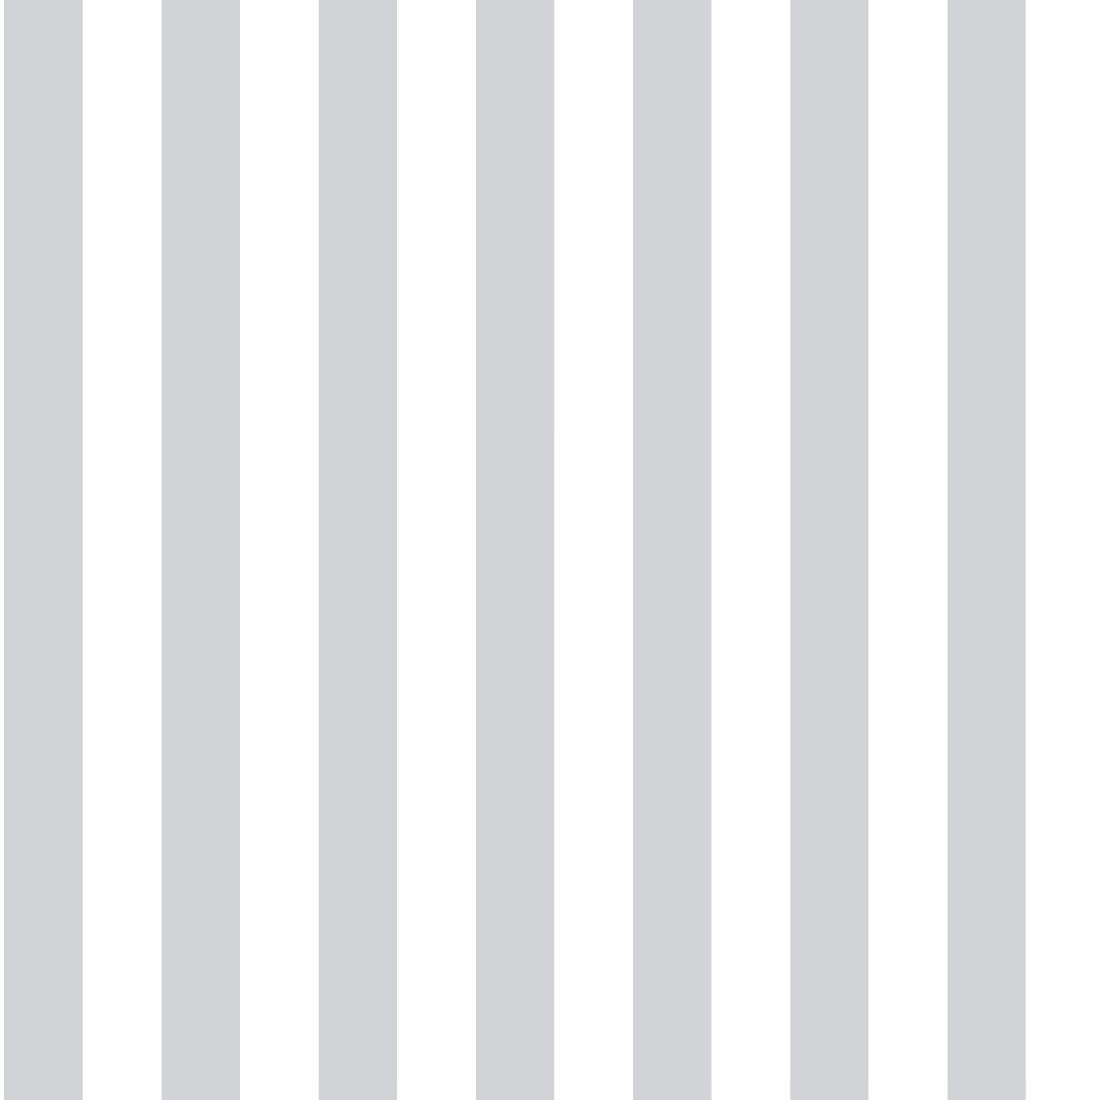 Papel De Parede Listras Verticais Estreitas Cinza e Branco